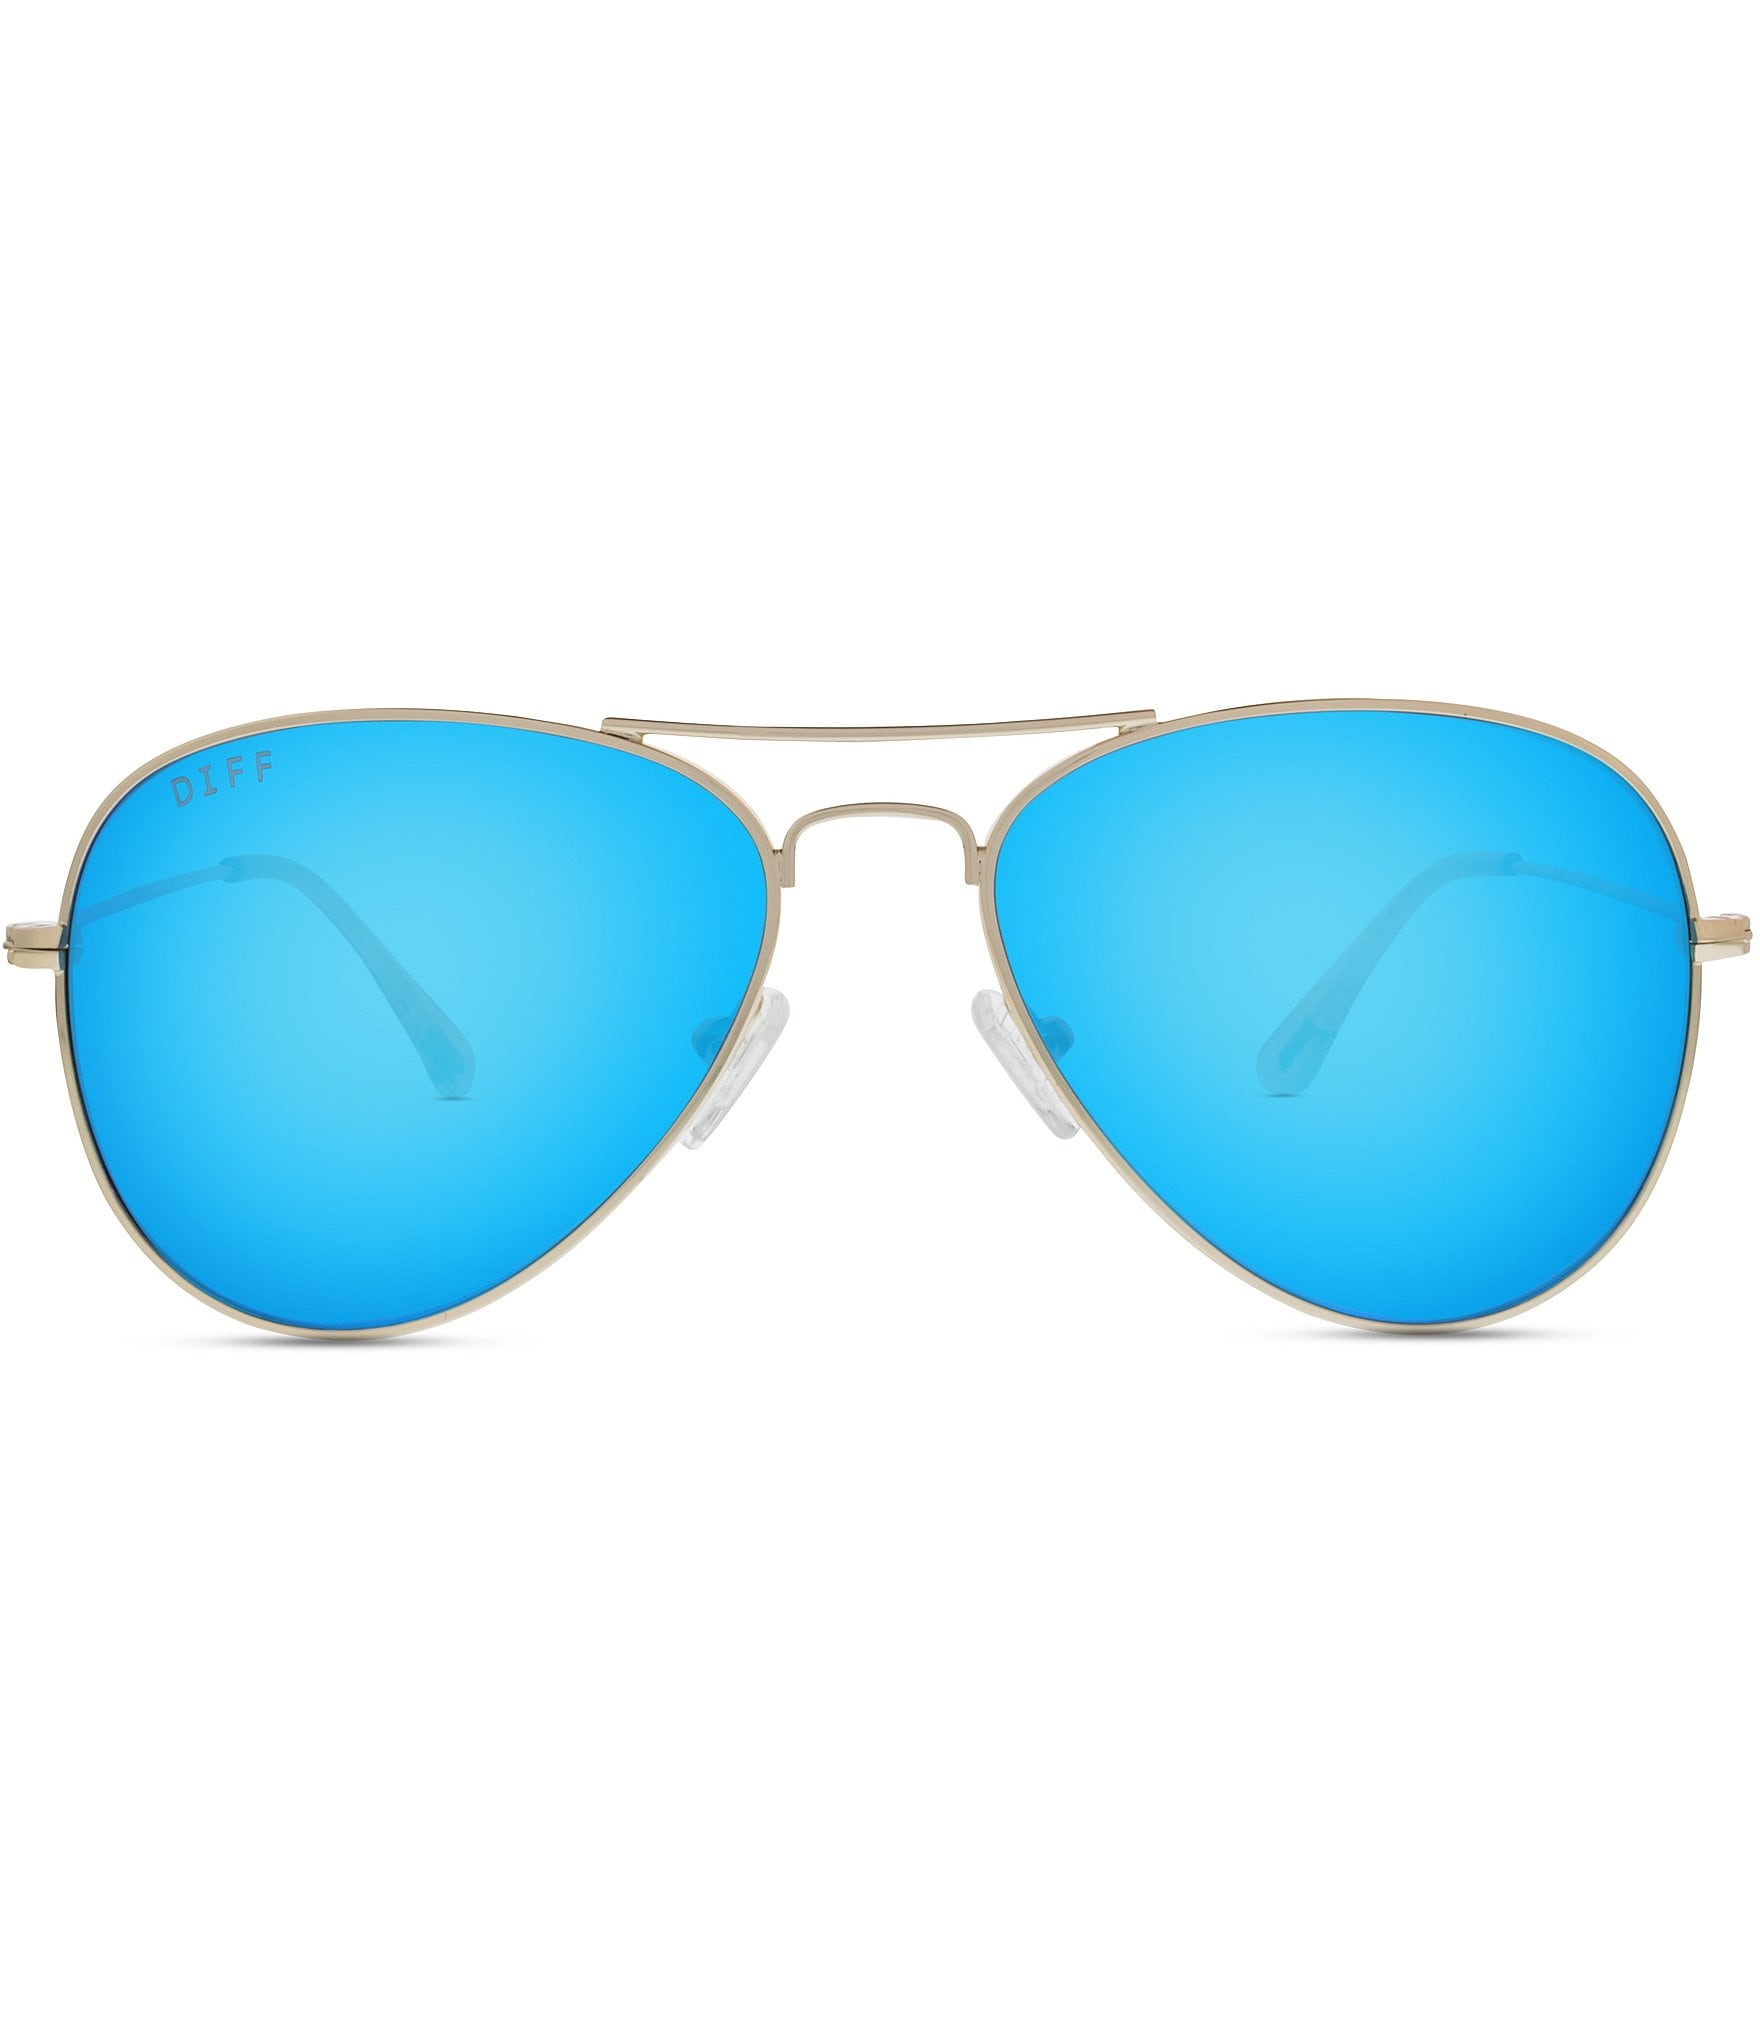 eab1995ea9 DIFF Eyewear Women s Sunglasses   Eyewear